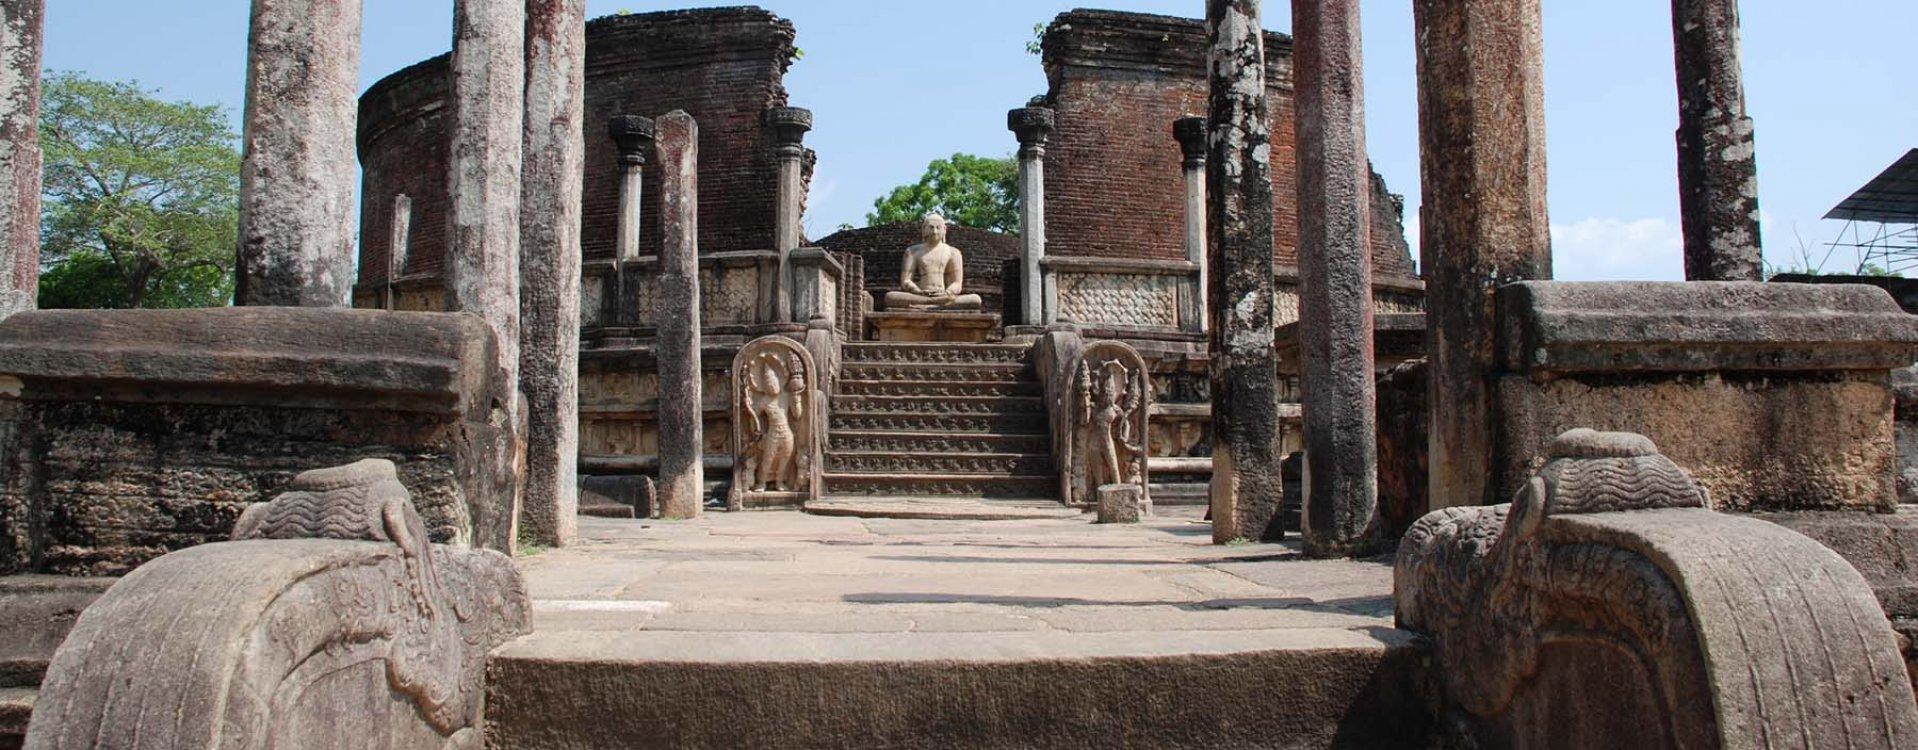 Ruïnes van Polonnaruwa